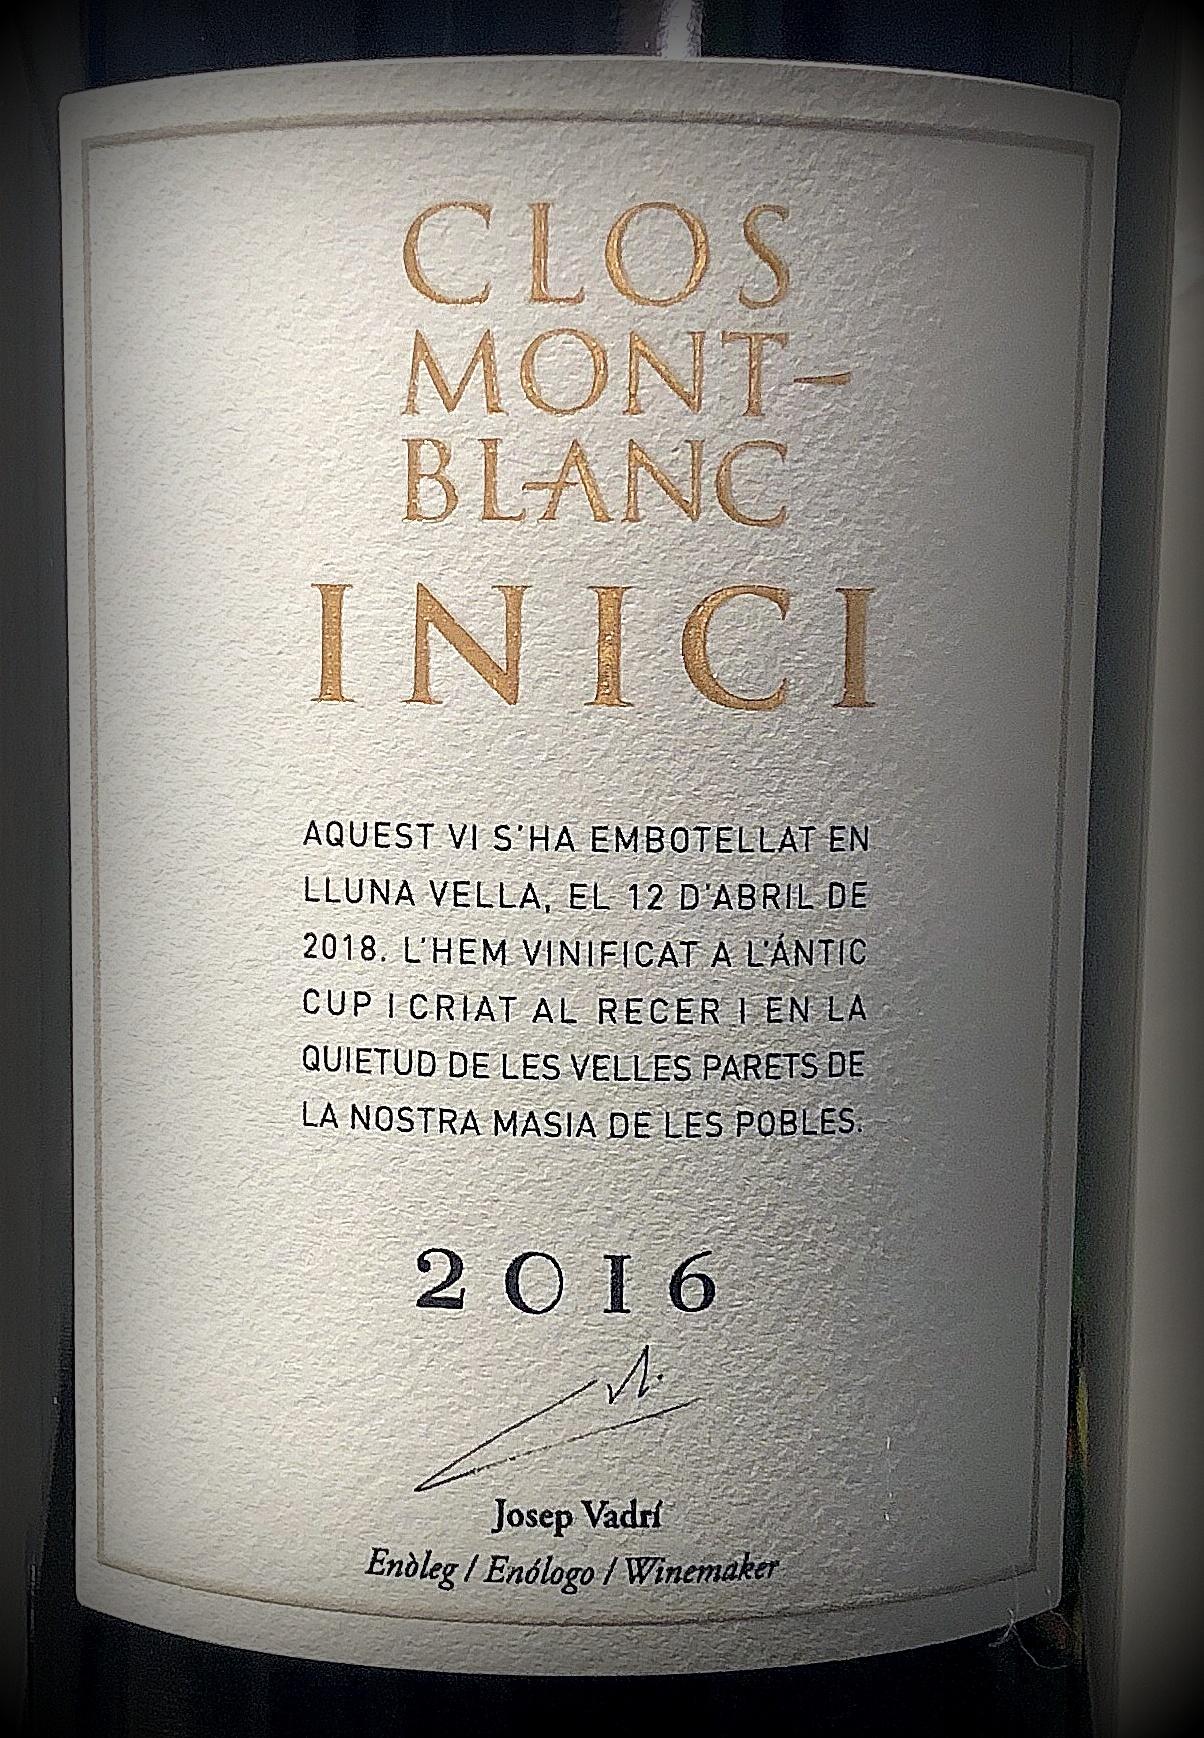 Clos Montblanc Inici